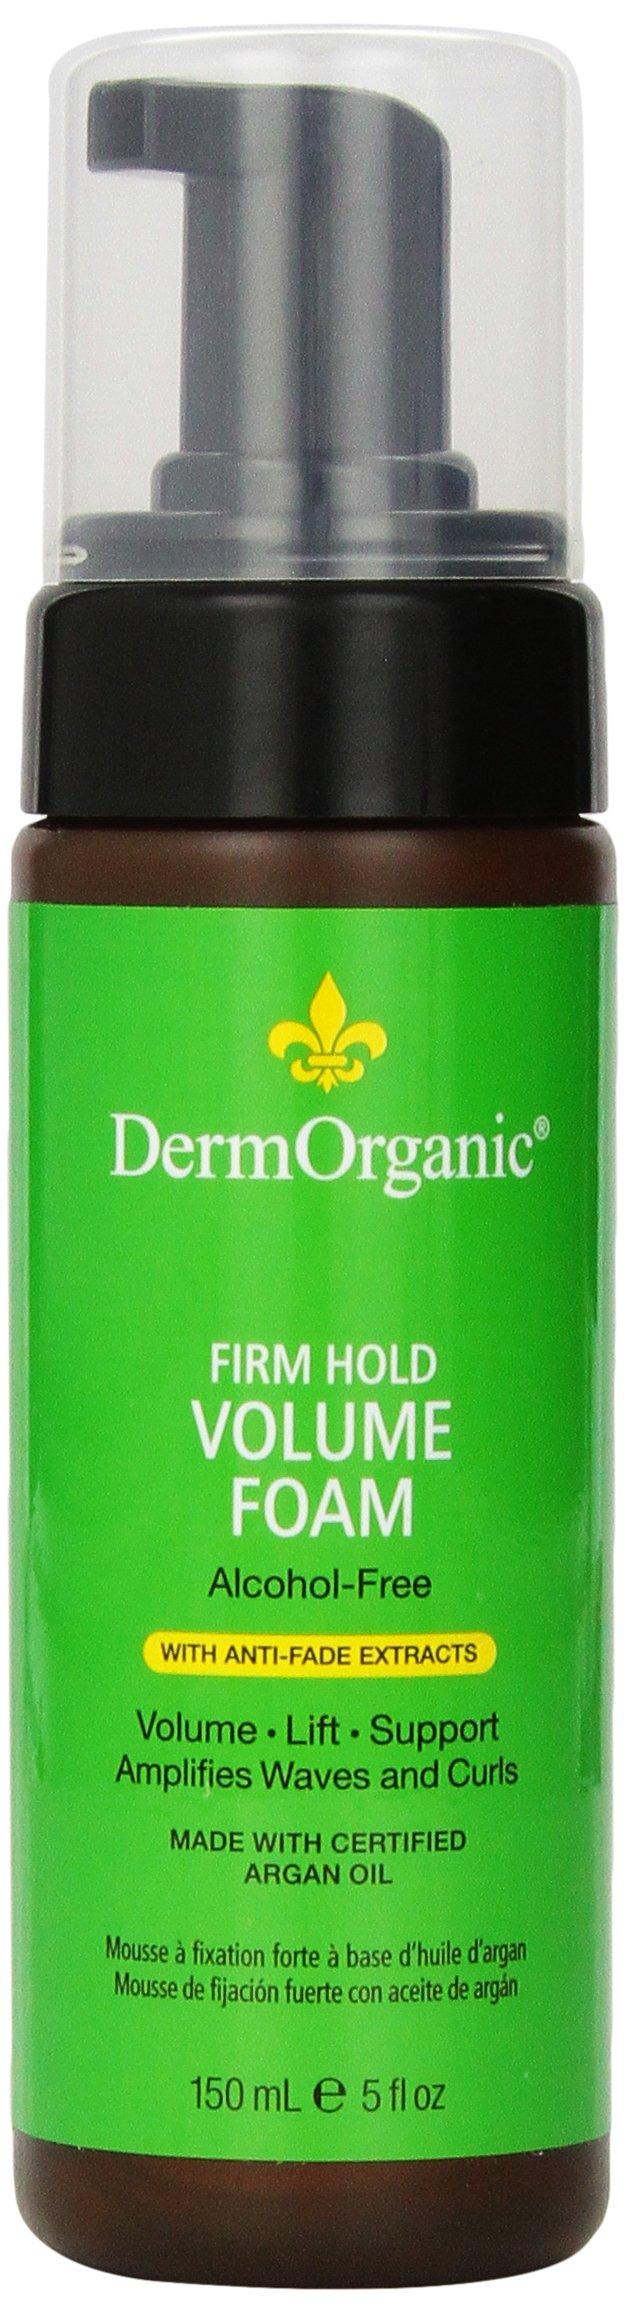 DermOrganic - Firm Hold Anti-Fade Volume Foam with Argan Oil